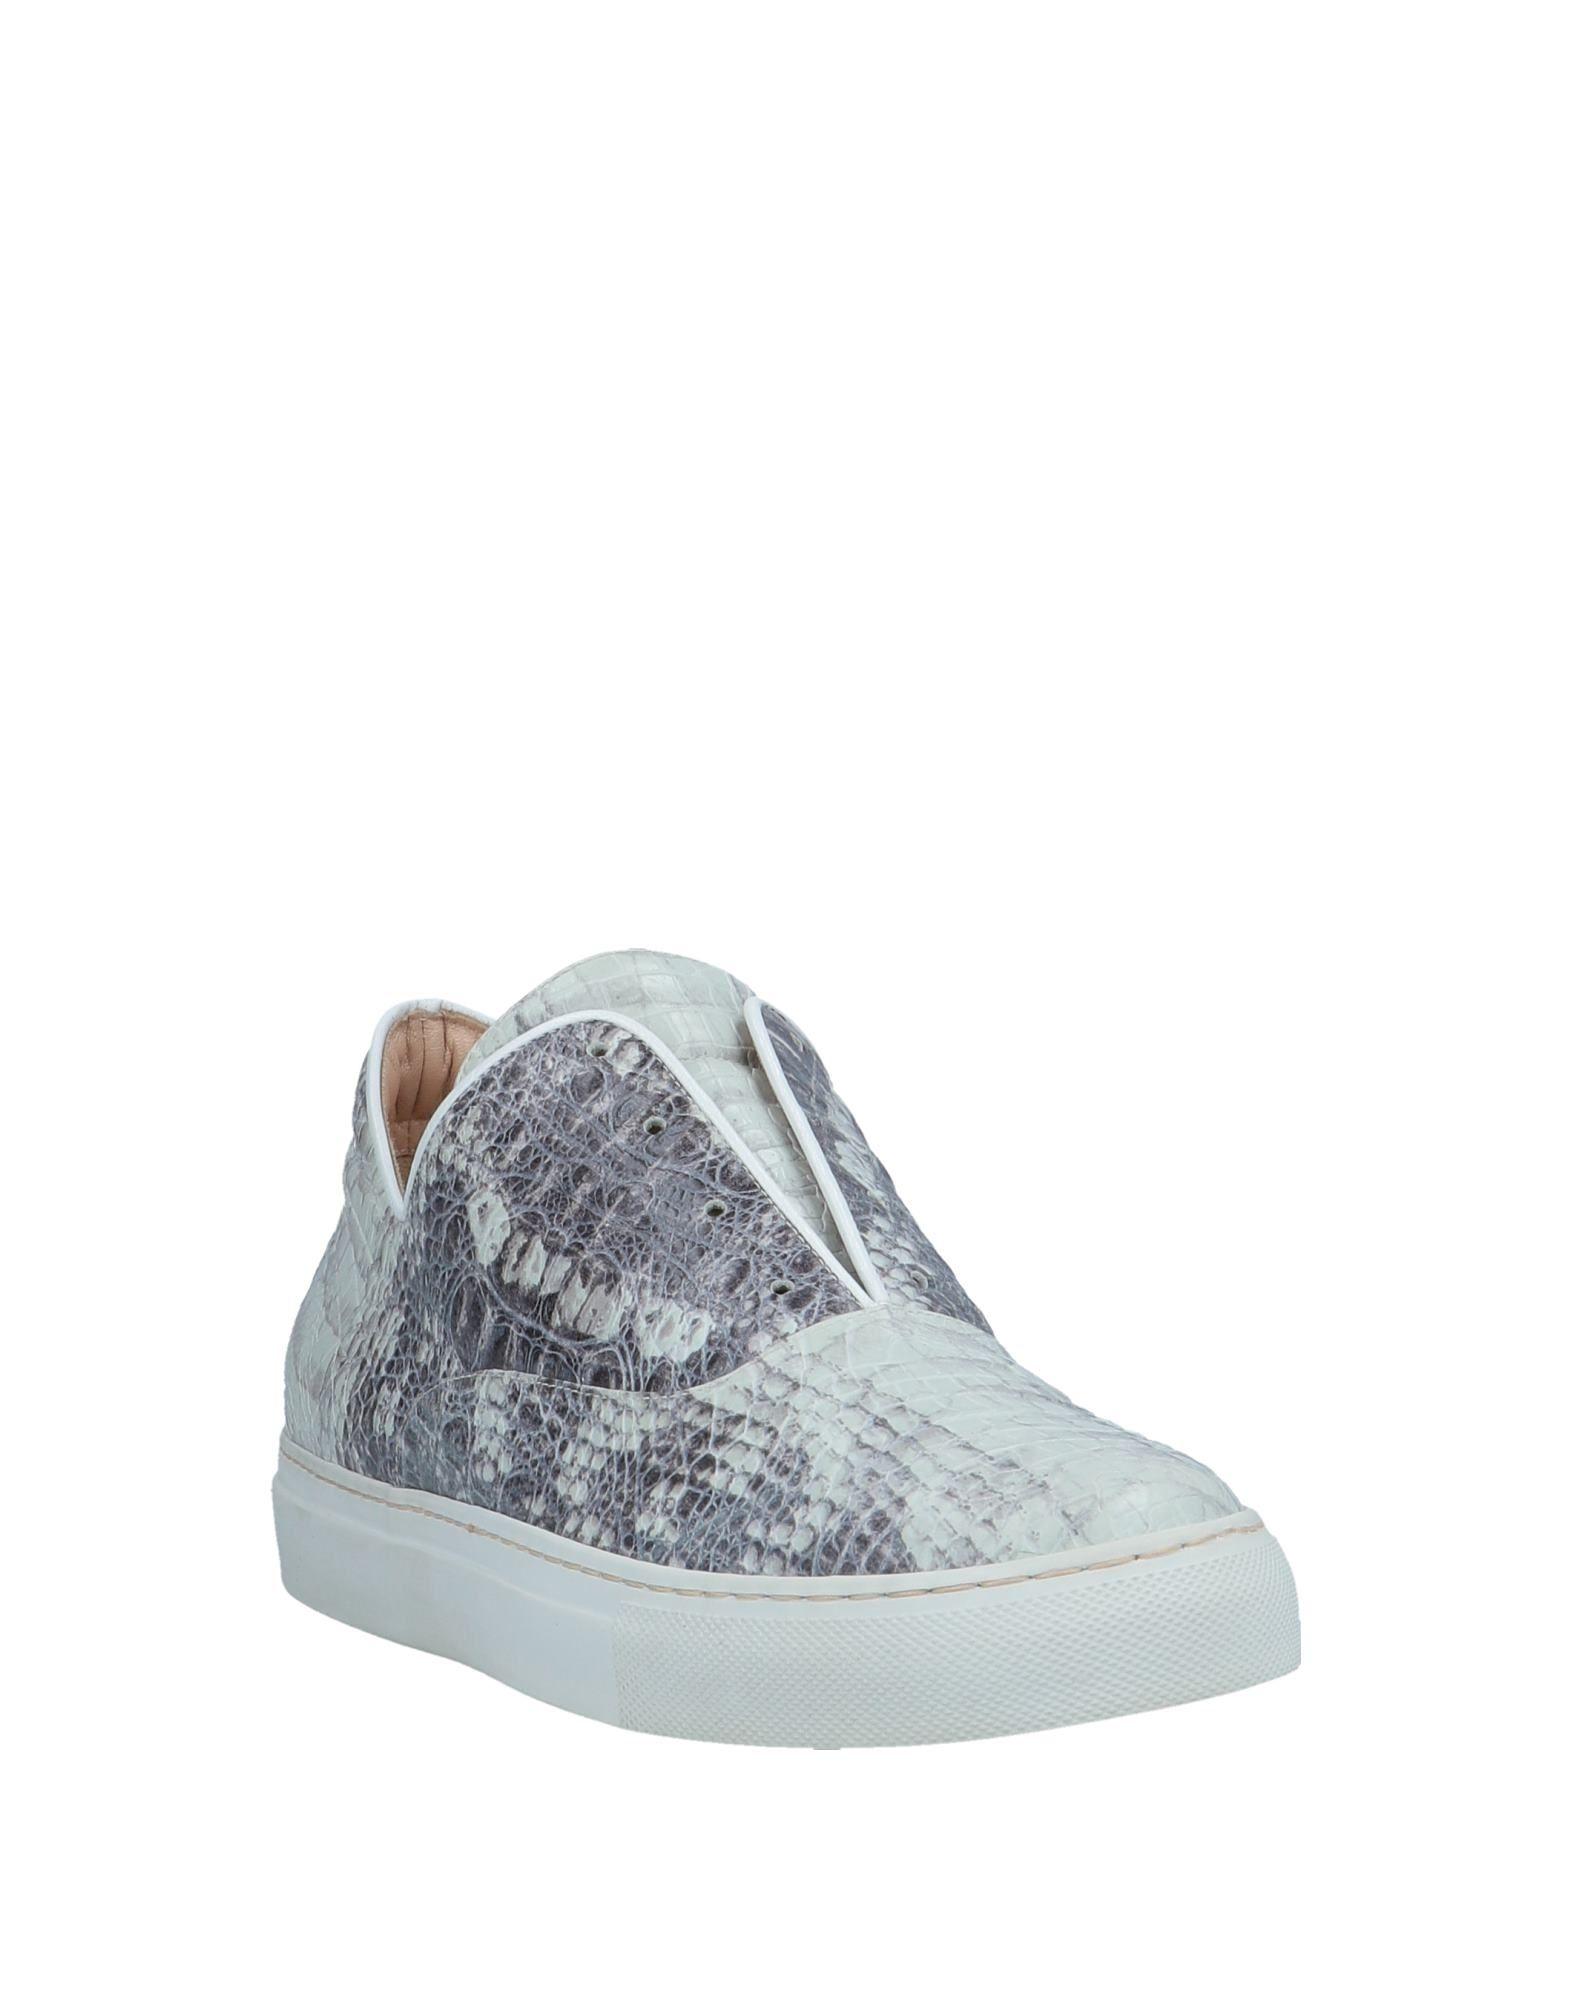 Dibrera By Paolo Zanoli Sneakers Herren  Schuhe 11565288FH Gute Qualität beliebte Schuhe  8a3535